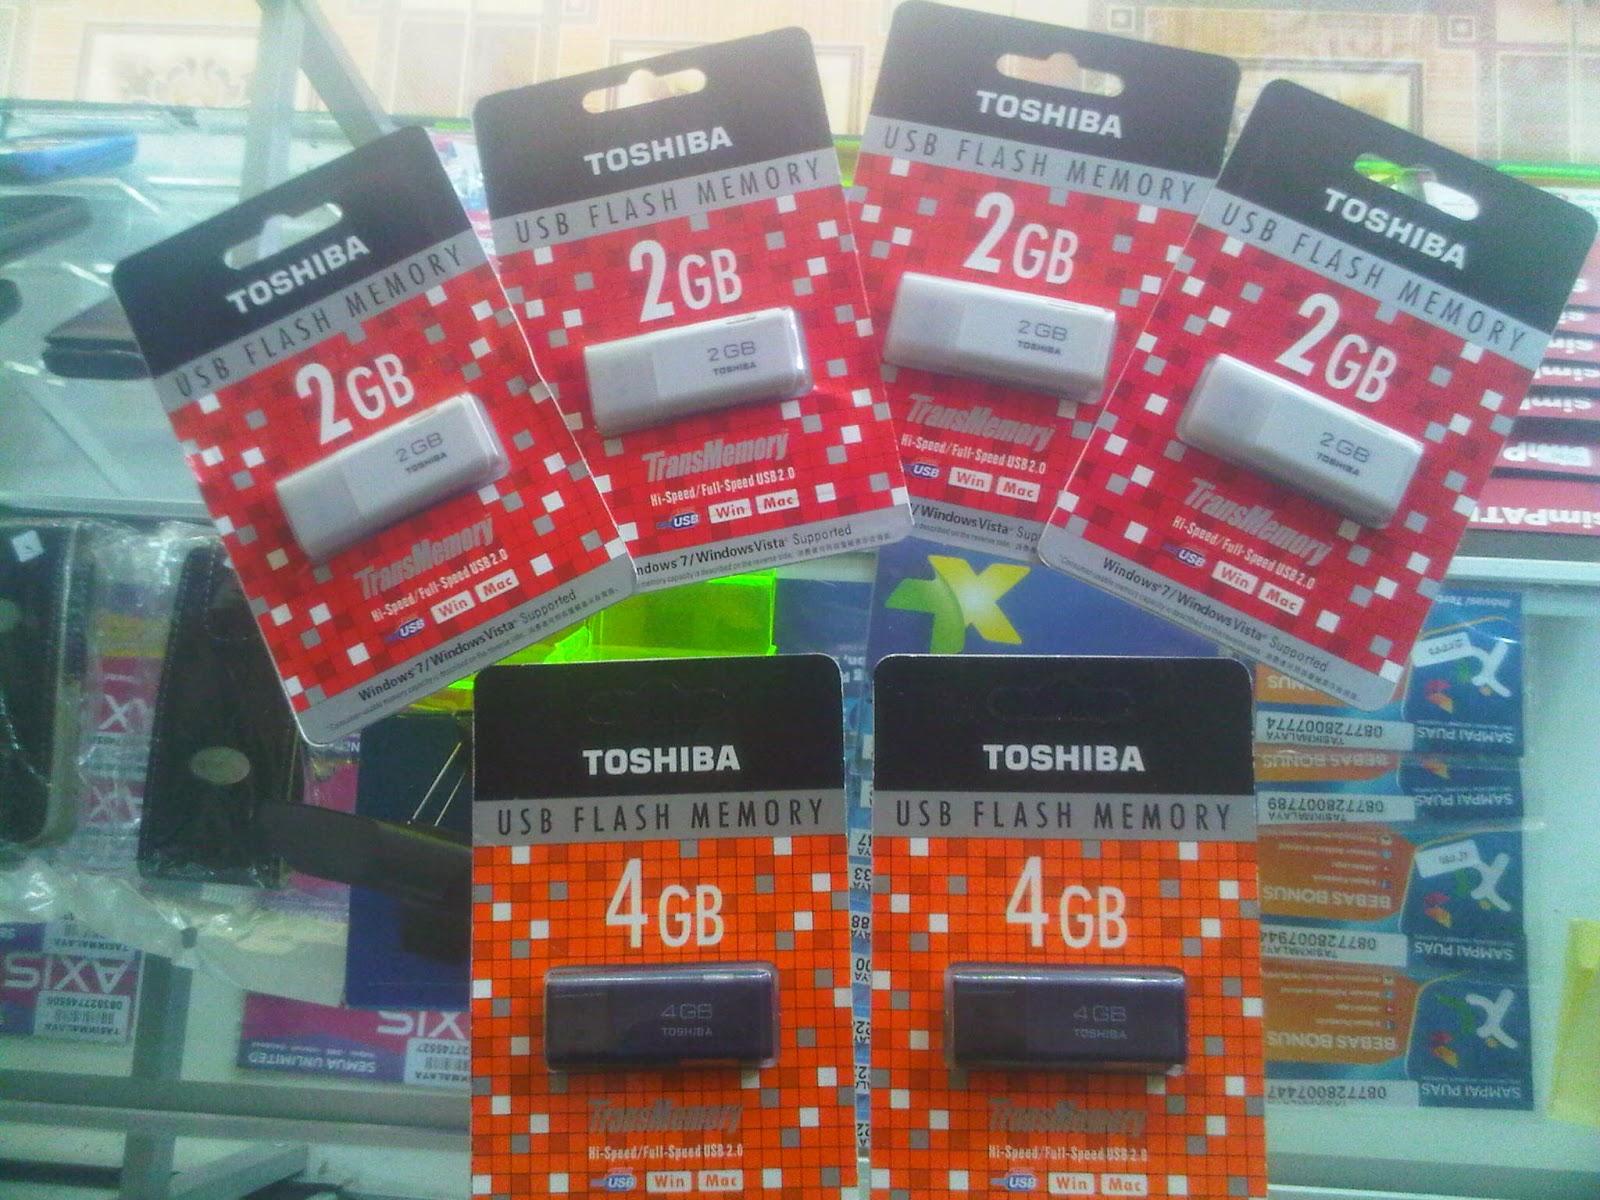 Sip Cell Agen Pulsa Dan Accesories Hp Flashdisk Toshiba Flash Disk 2 Gb